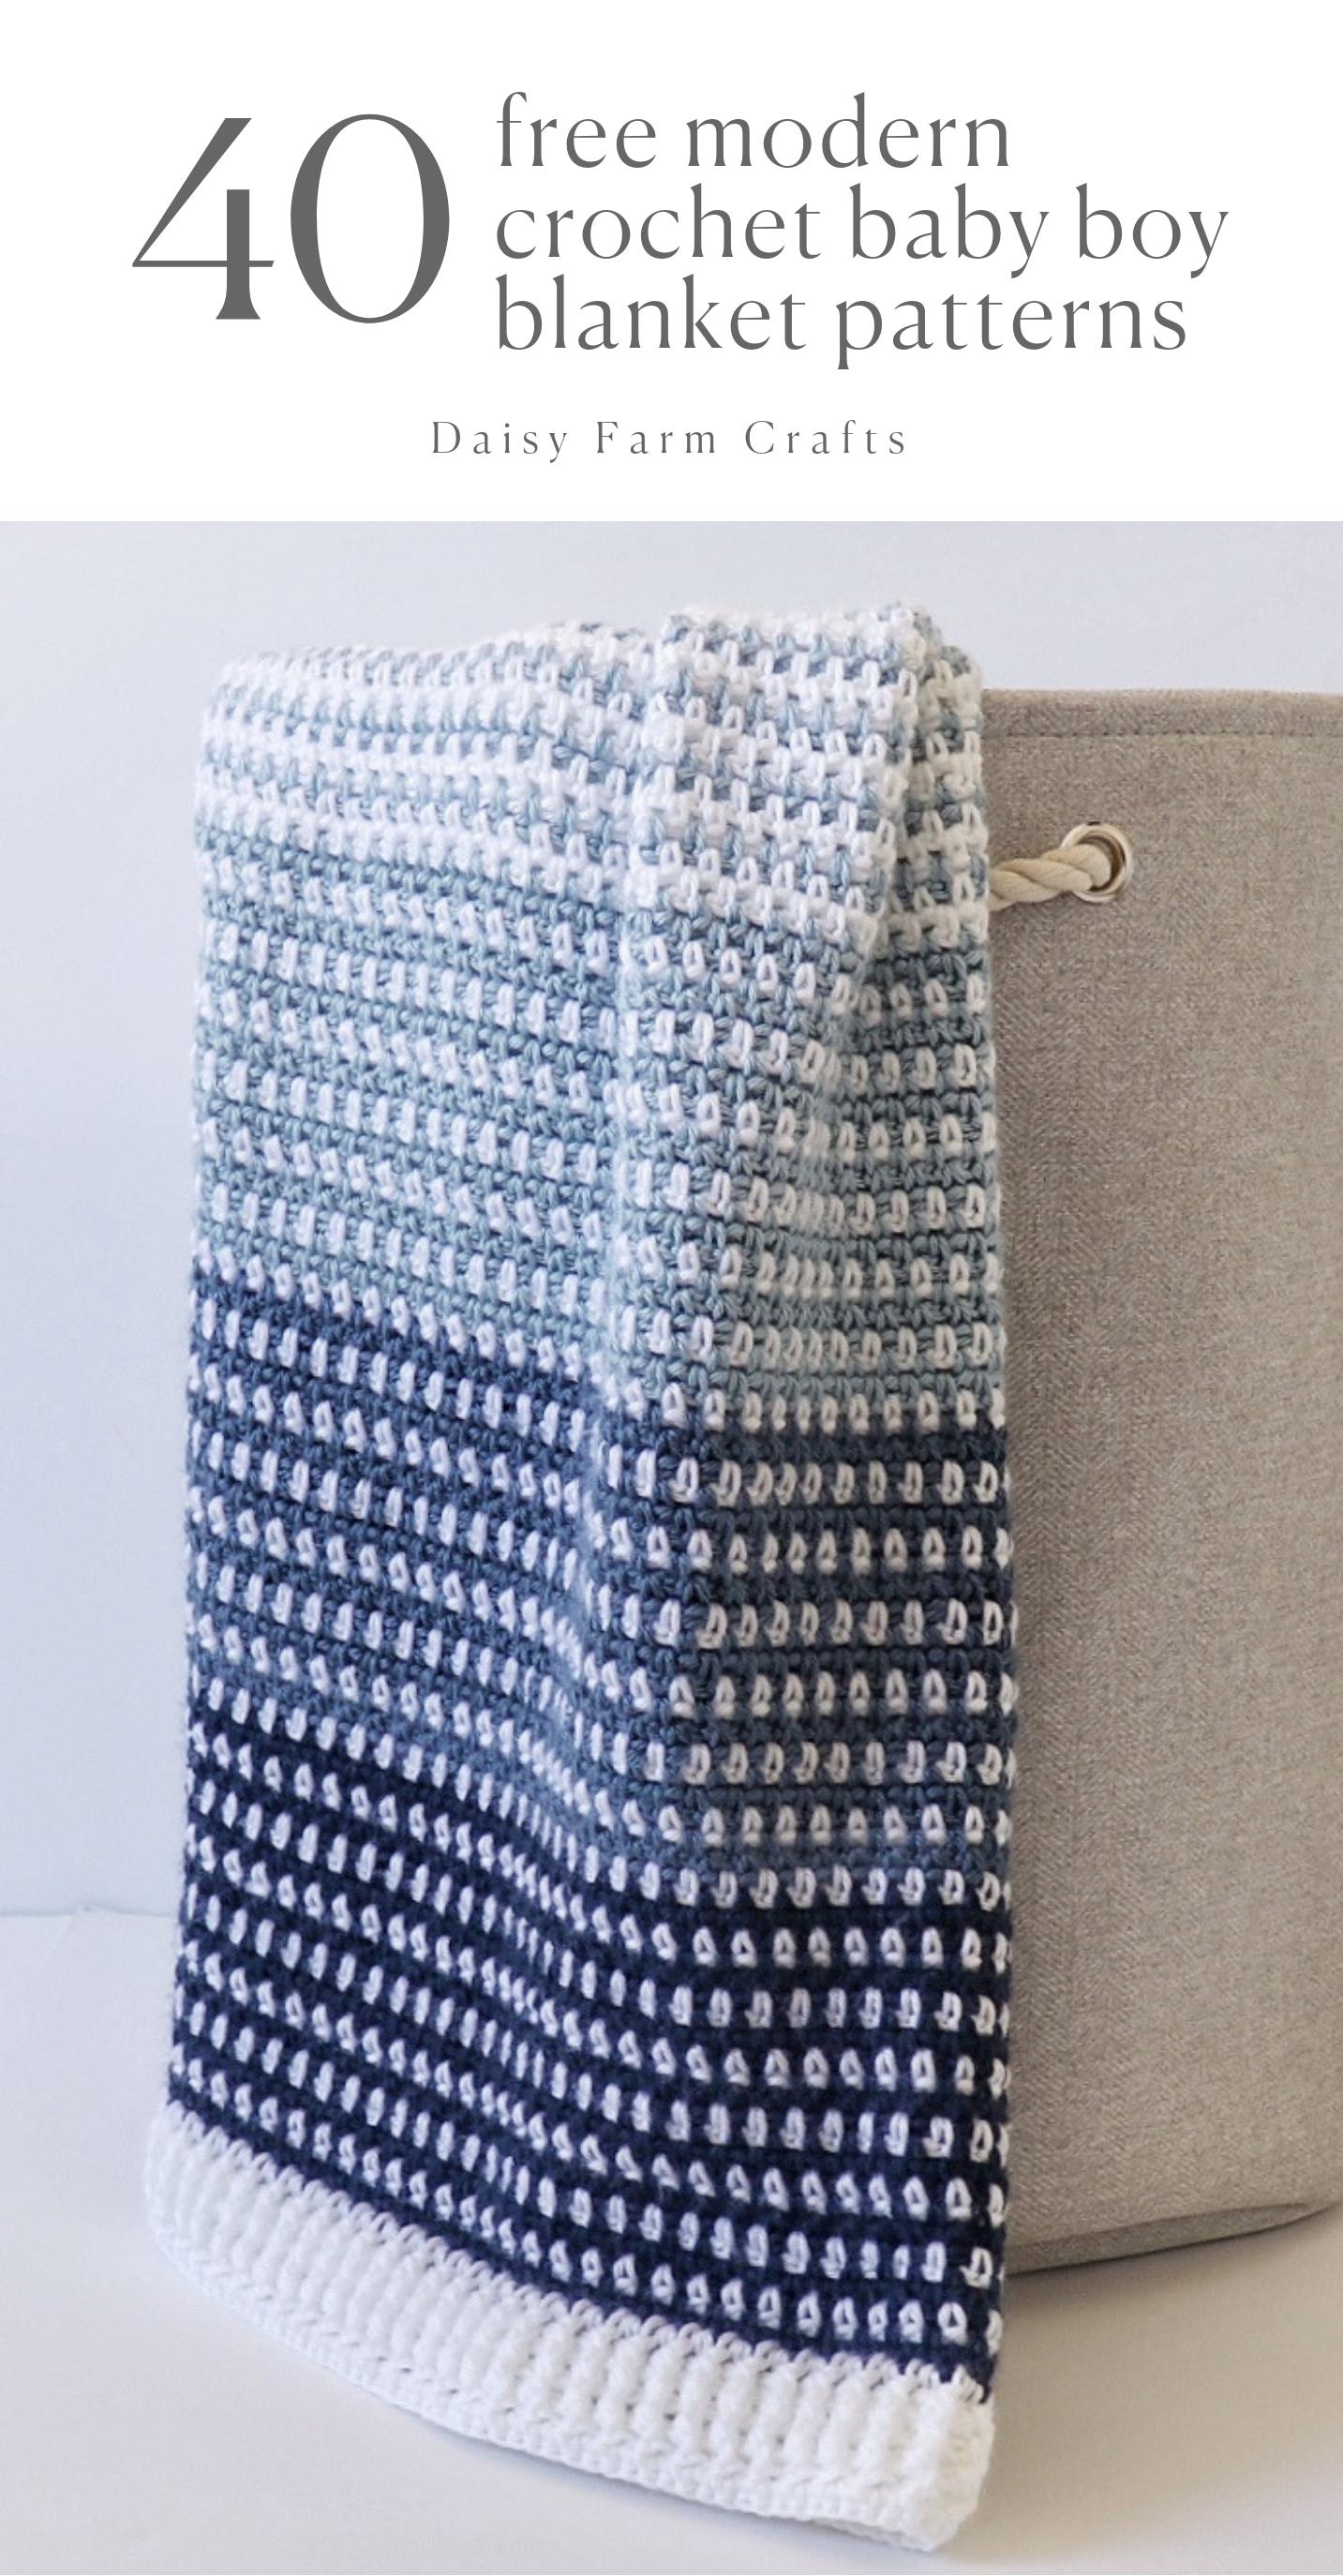 Photo of 40 Free Modern Crochet Baby Boy Blanket Patterns from Daisy Farm Crafts #Häkeld…